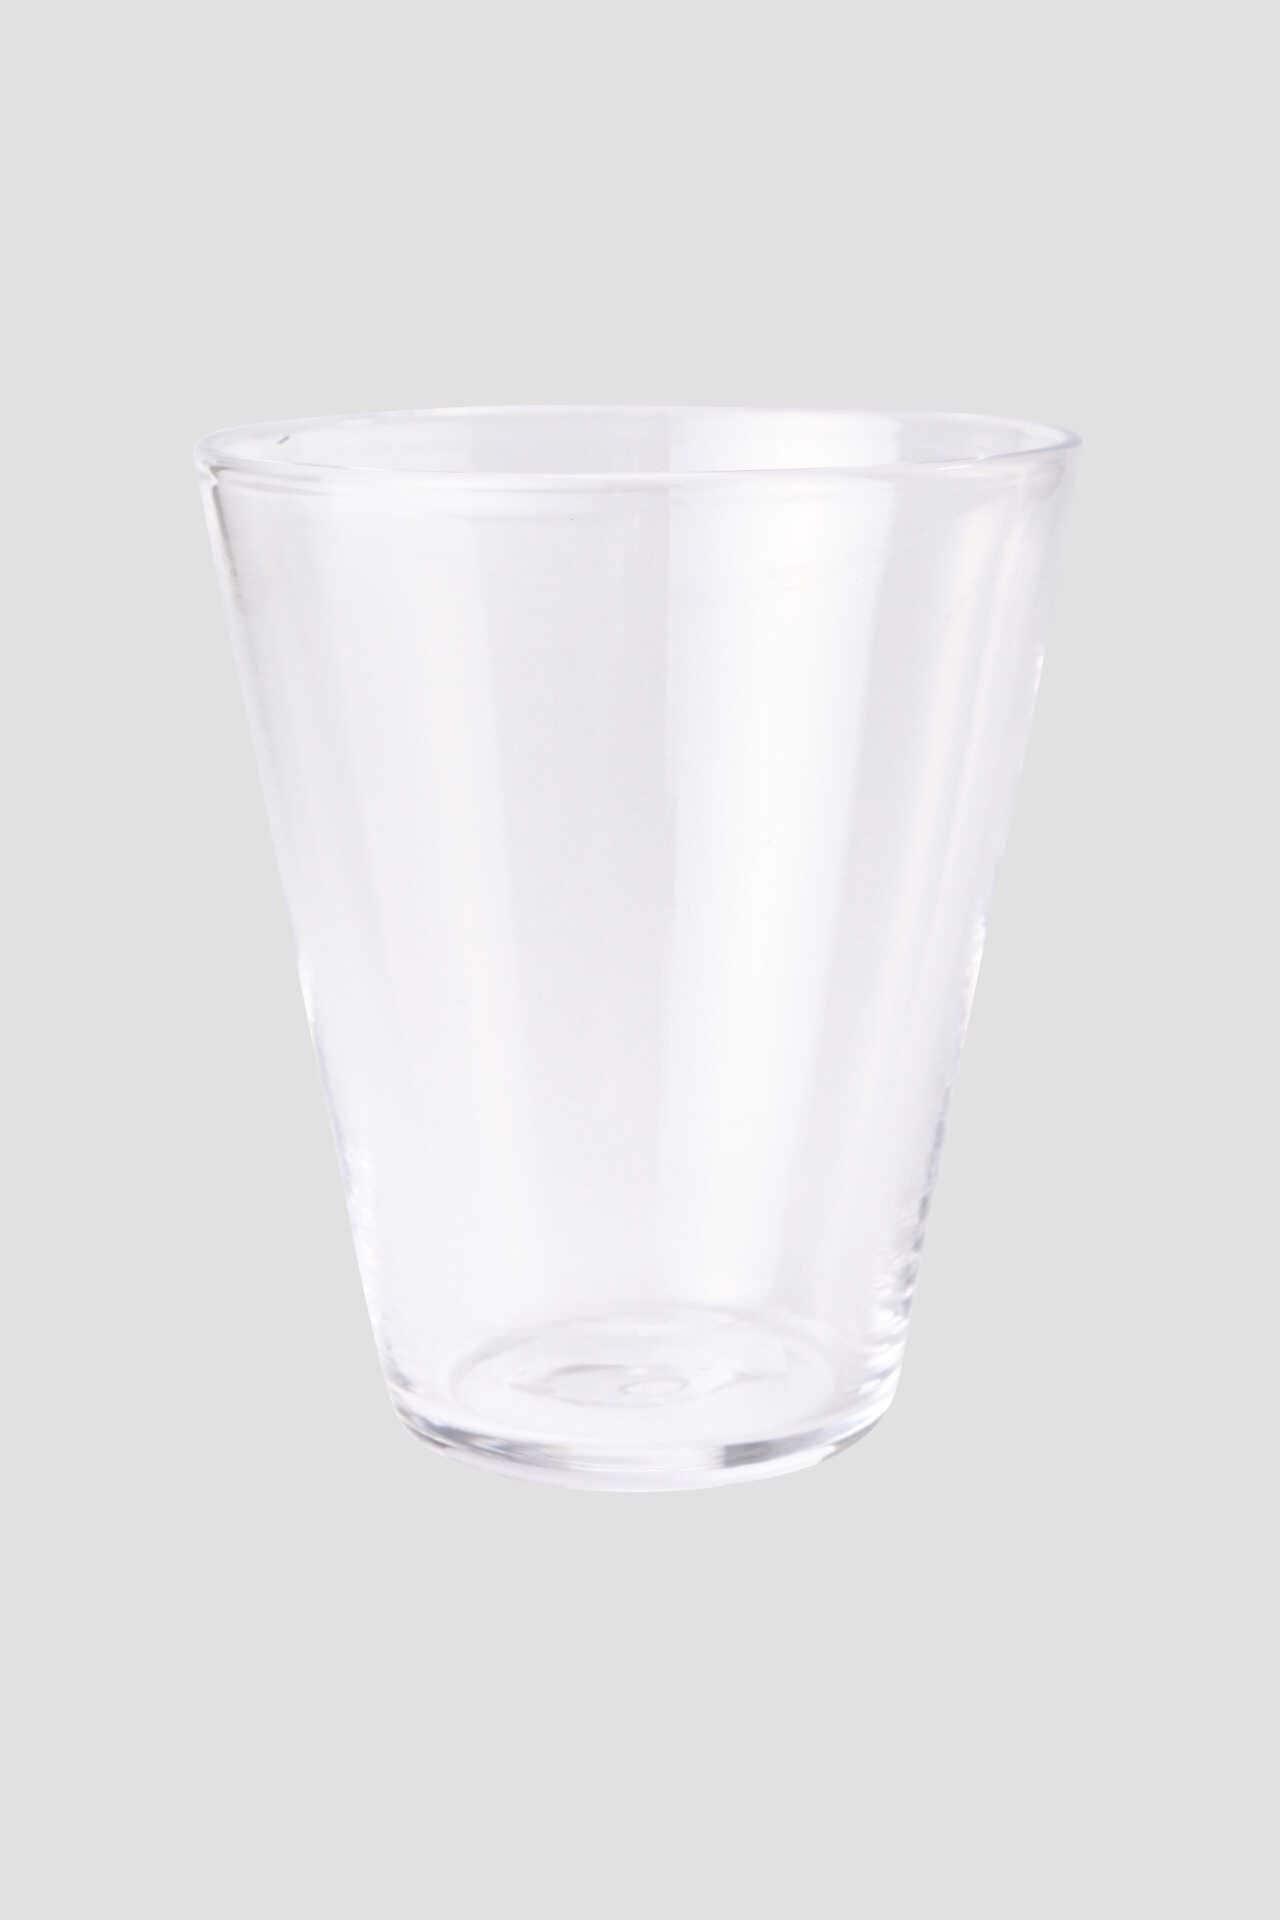 BLOWN GLASS WATER TUMBLER8